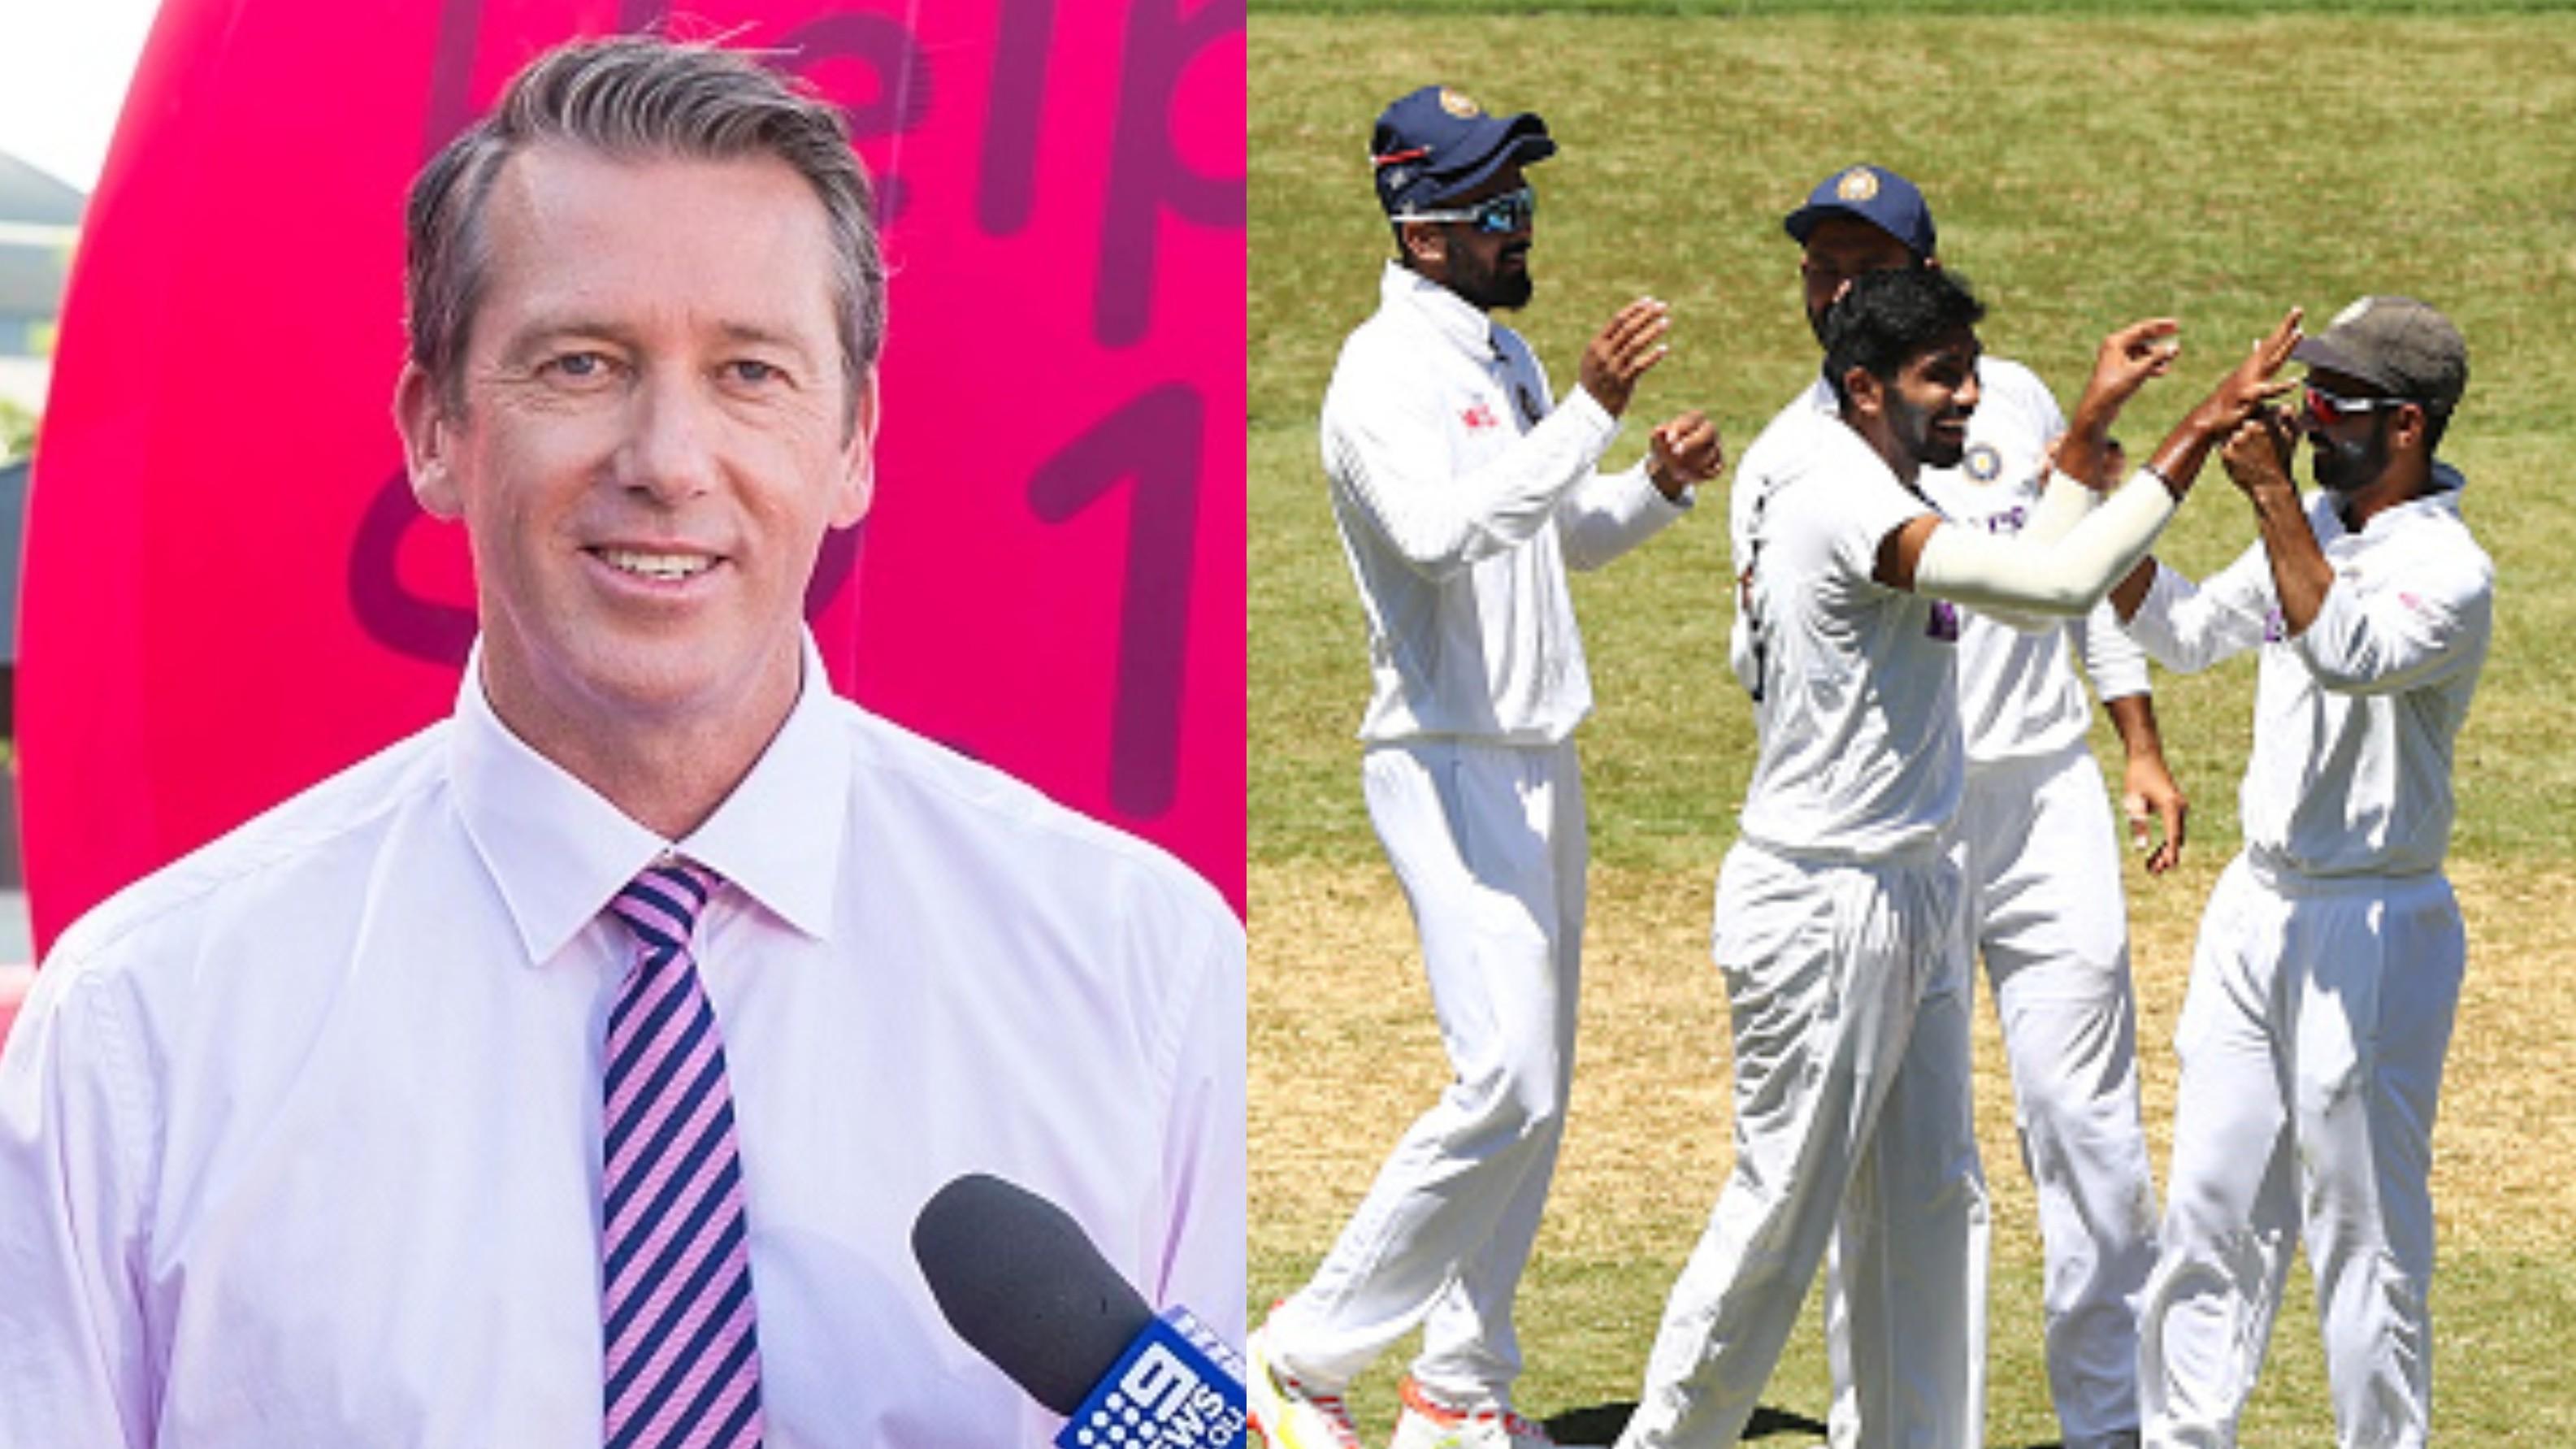 AUS v IND 2020-21: Glenn McGrath lauds Ajinkya Rahane's captaincy as India bundles Australia out for 195